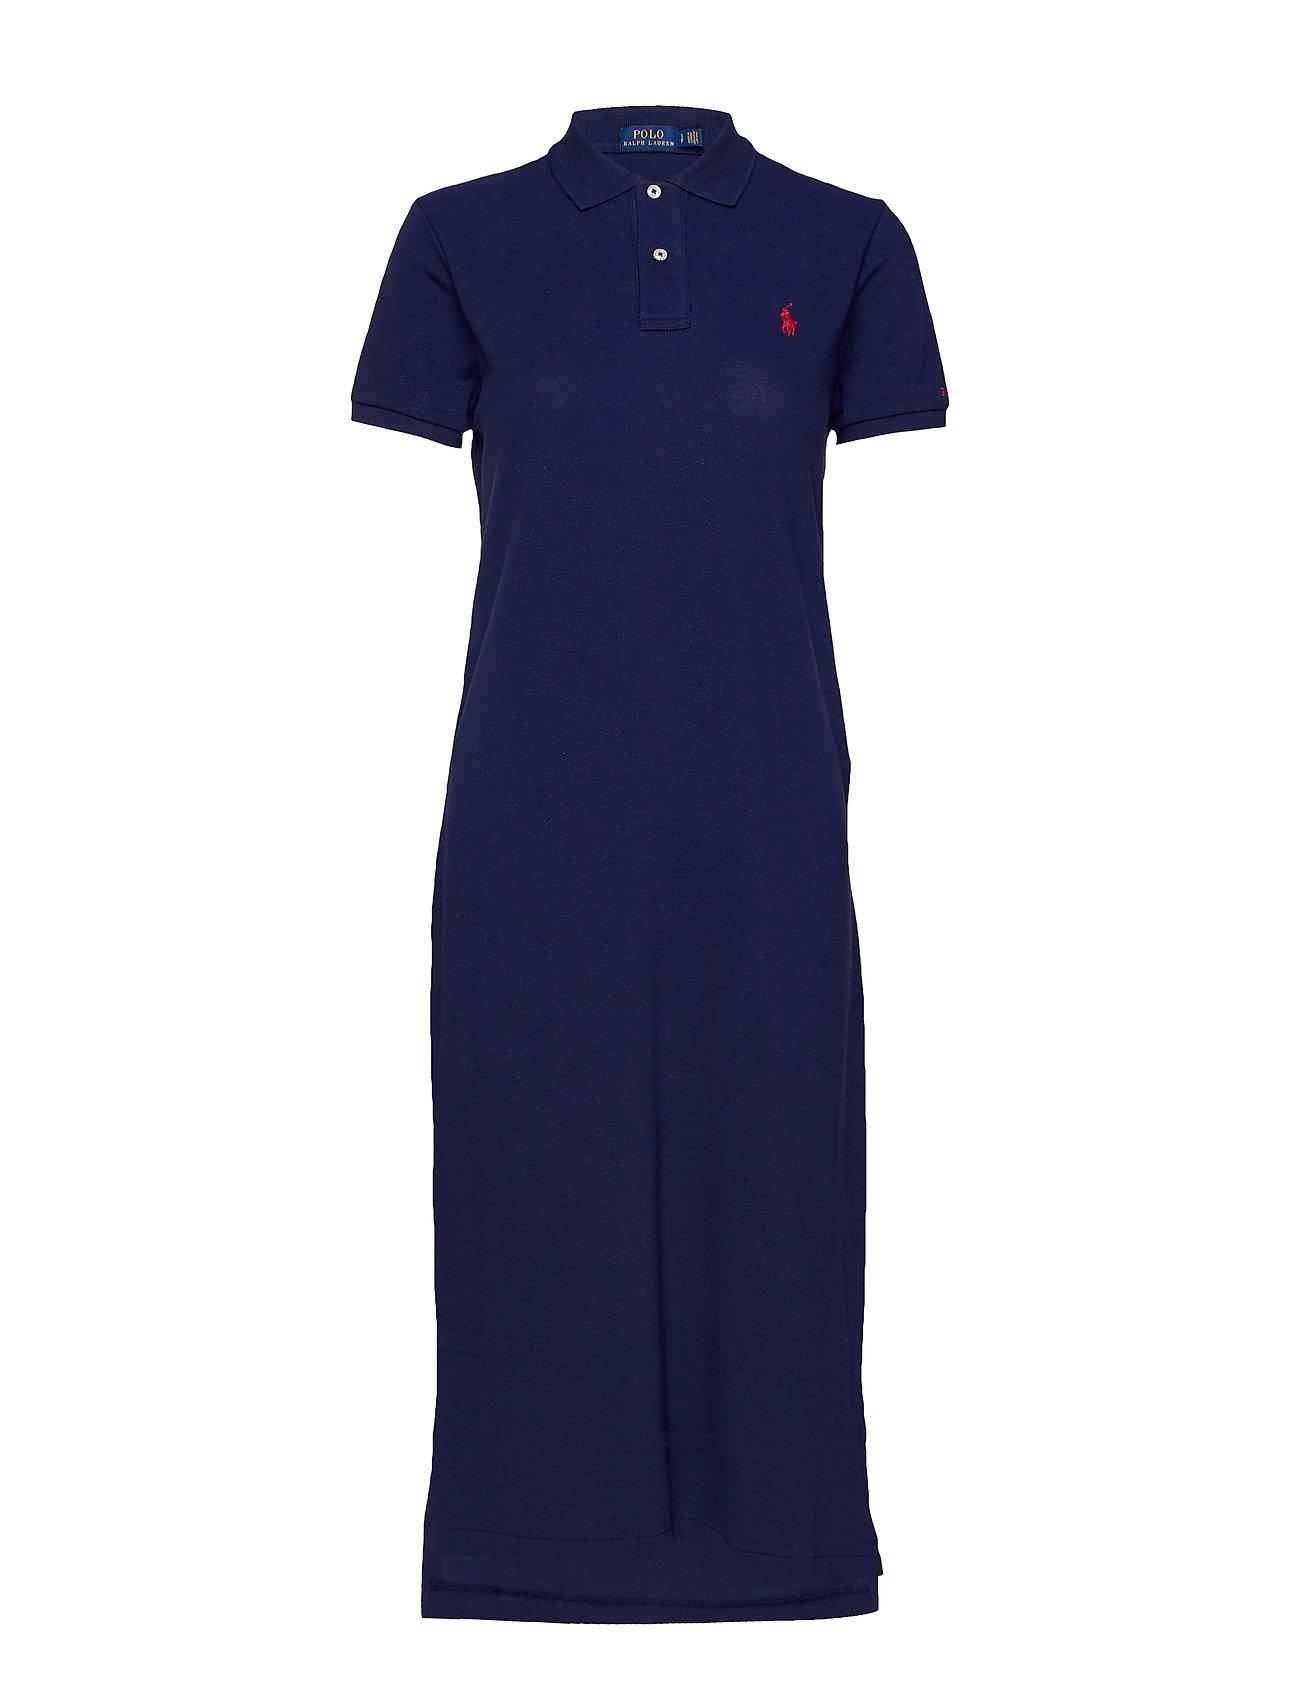 ralph lauren polo shirt dress womens Shop Clothing & Shoes Online